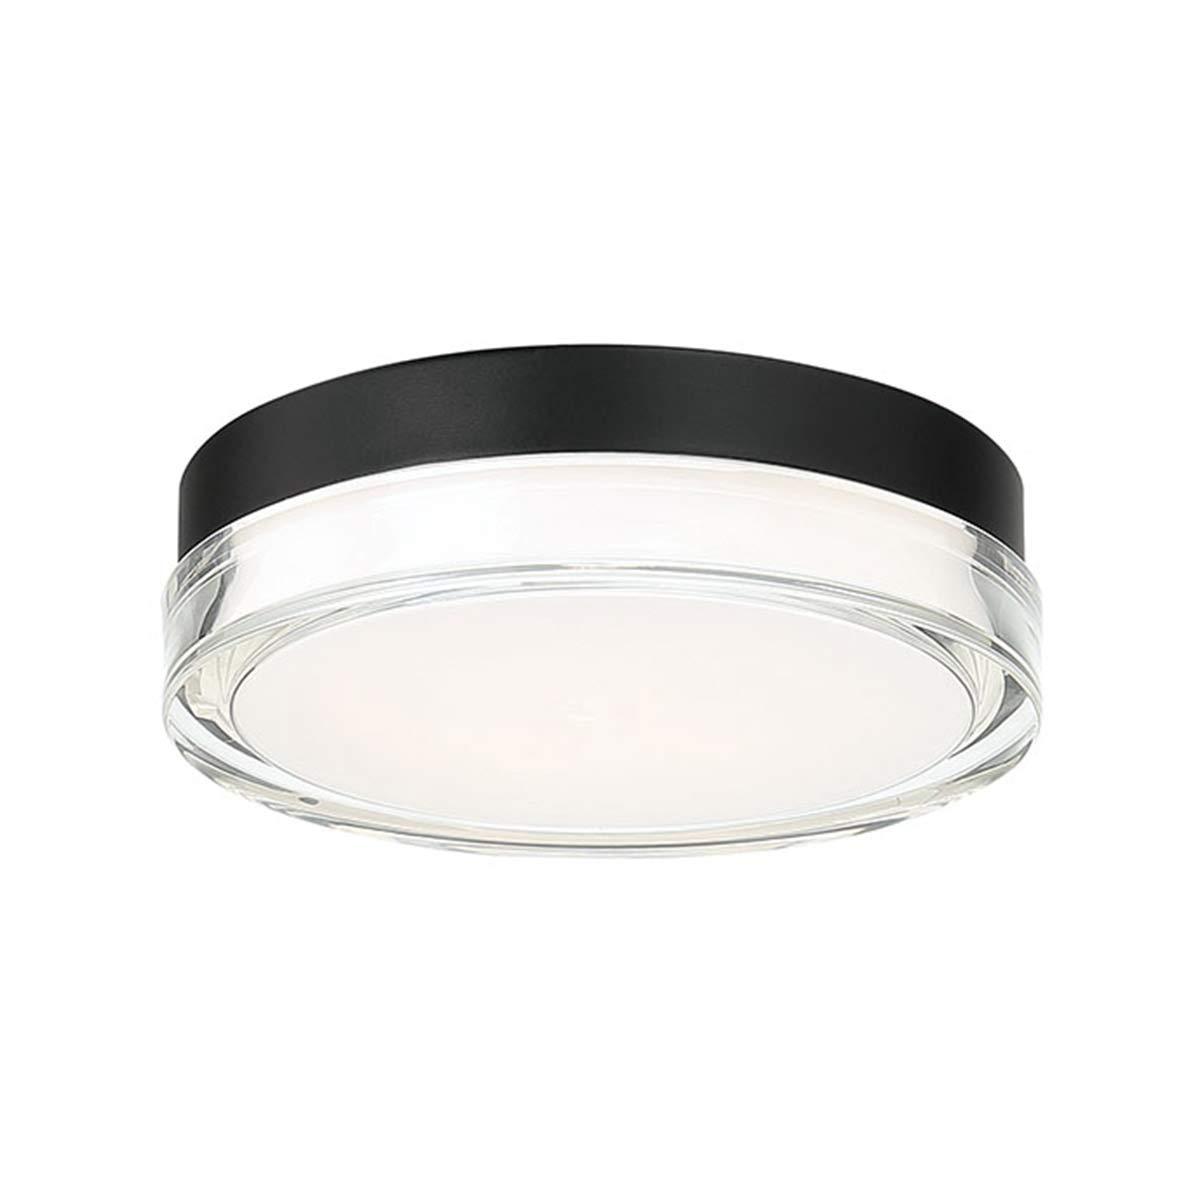 9 Inches, WAC Lighting FM-W57809-30-BK DweLED Dot 9in LED Round Flush Mount 3000K in Black Light Fixture